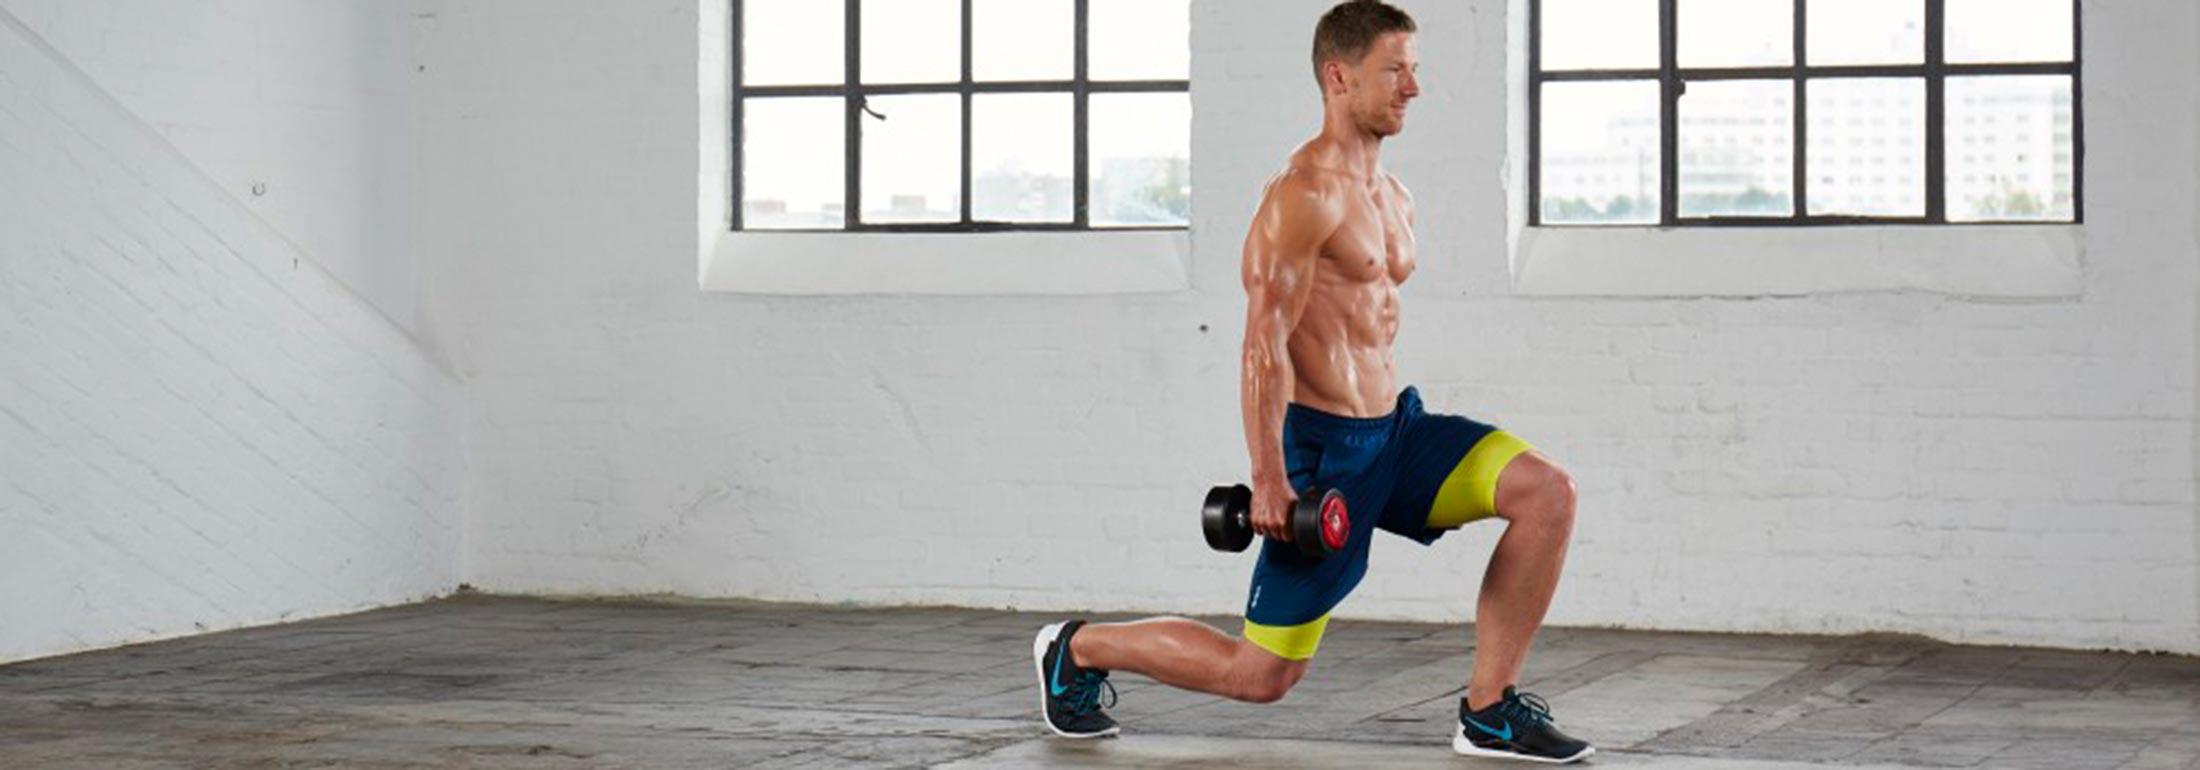 Muskelaufbau Übungen Ausfallschritte